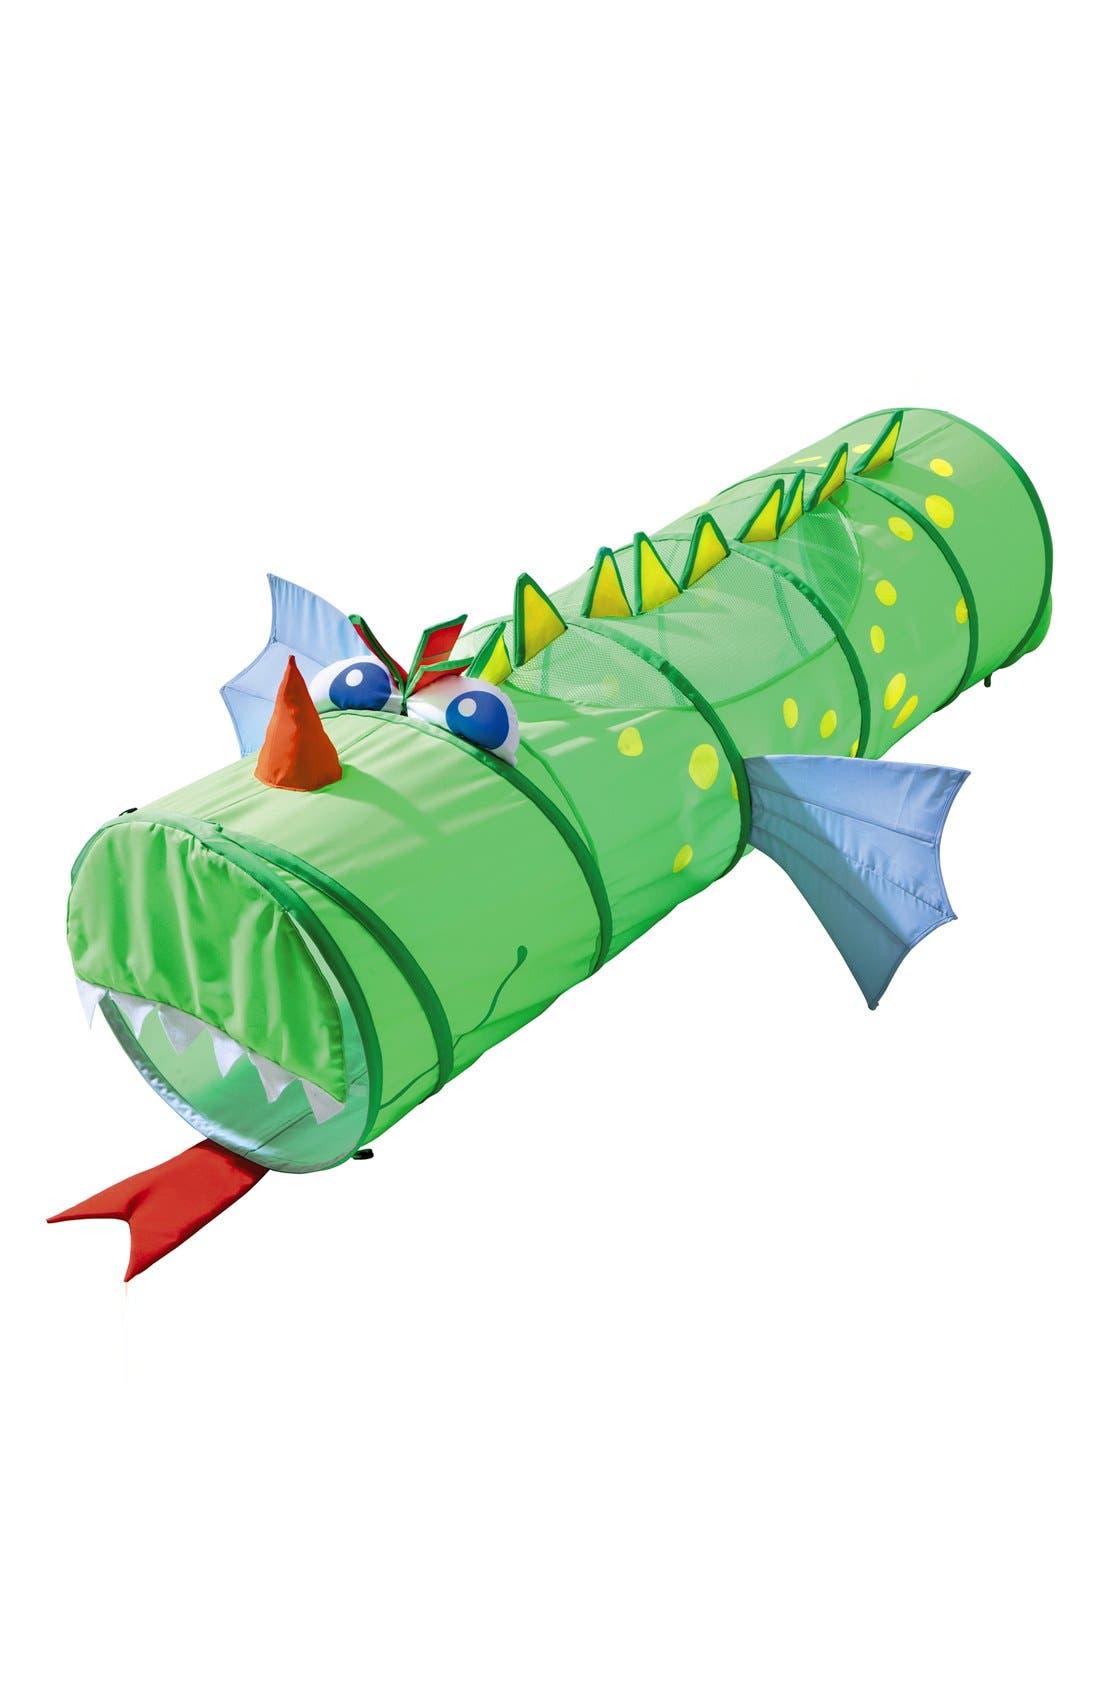 HABA 'Croco Kuno' Dragon Crawling Tunnel